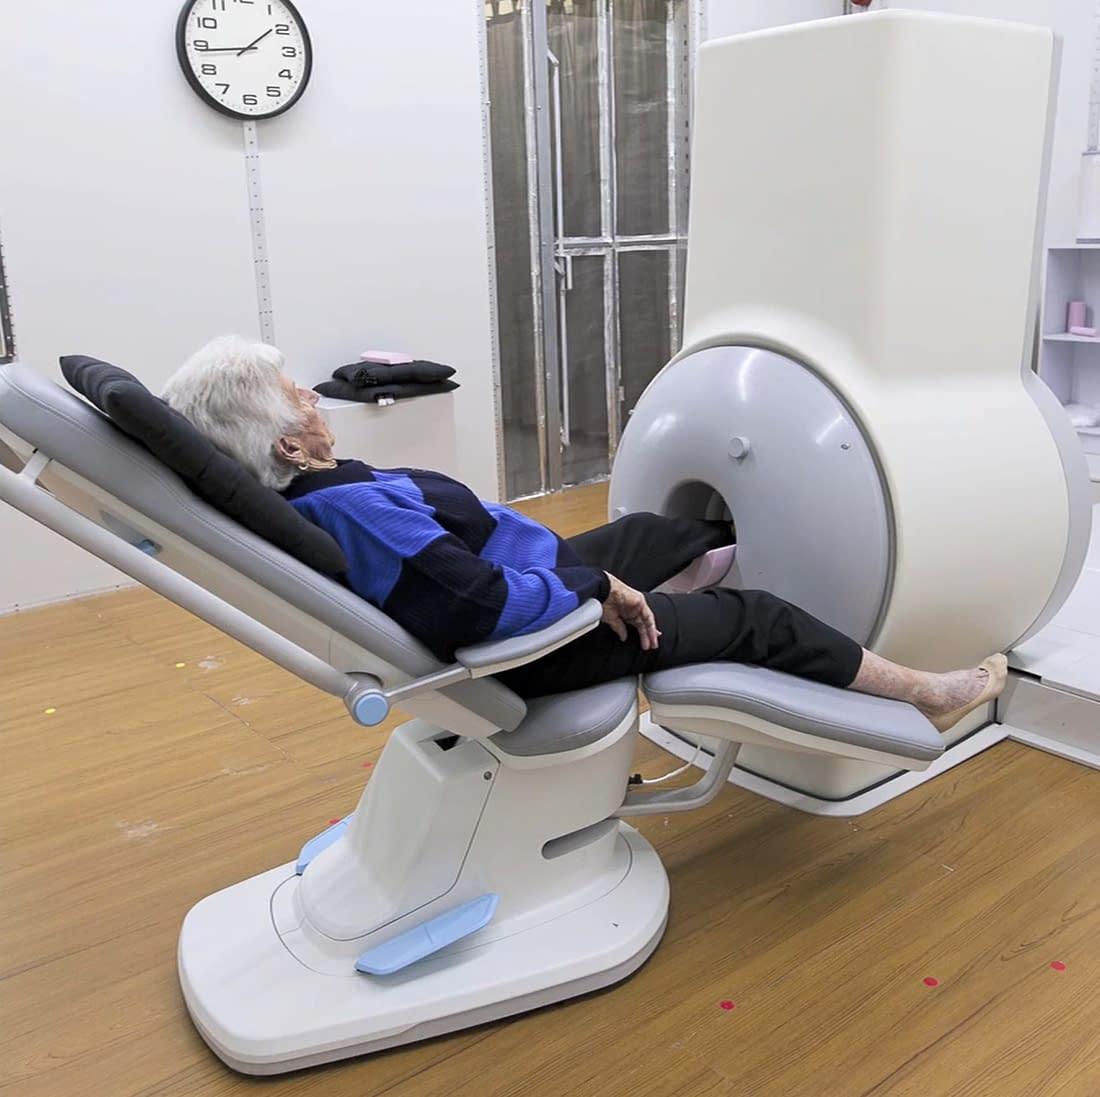 Ankle MRI Scan